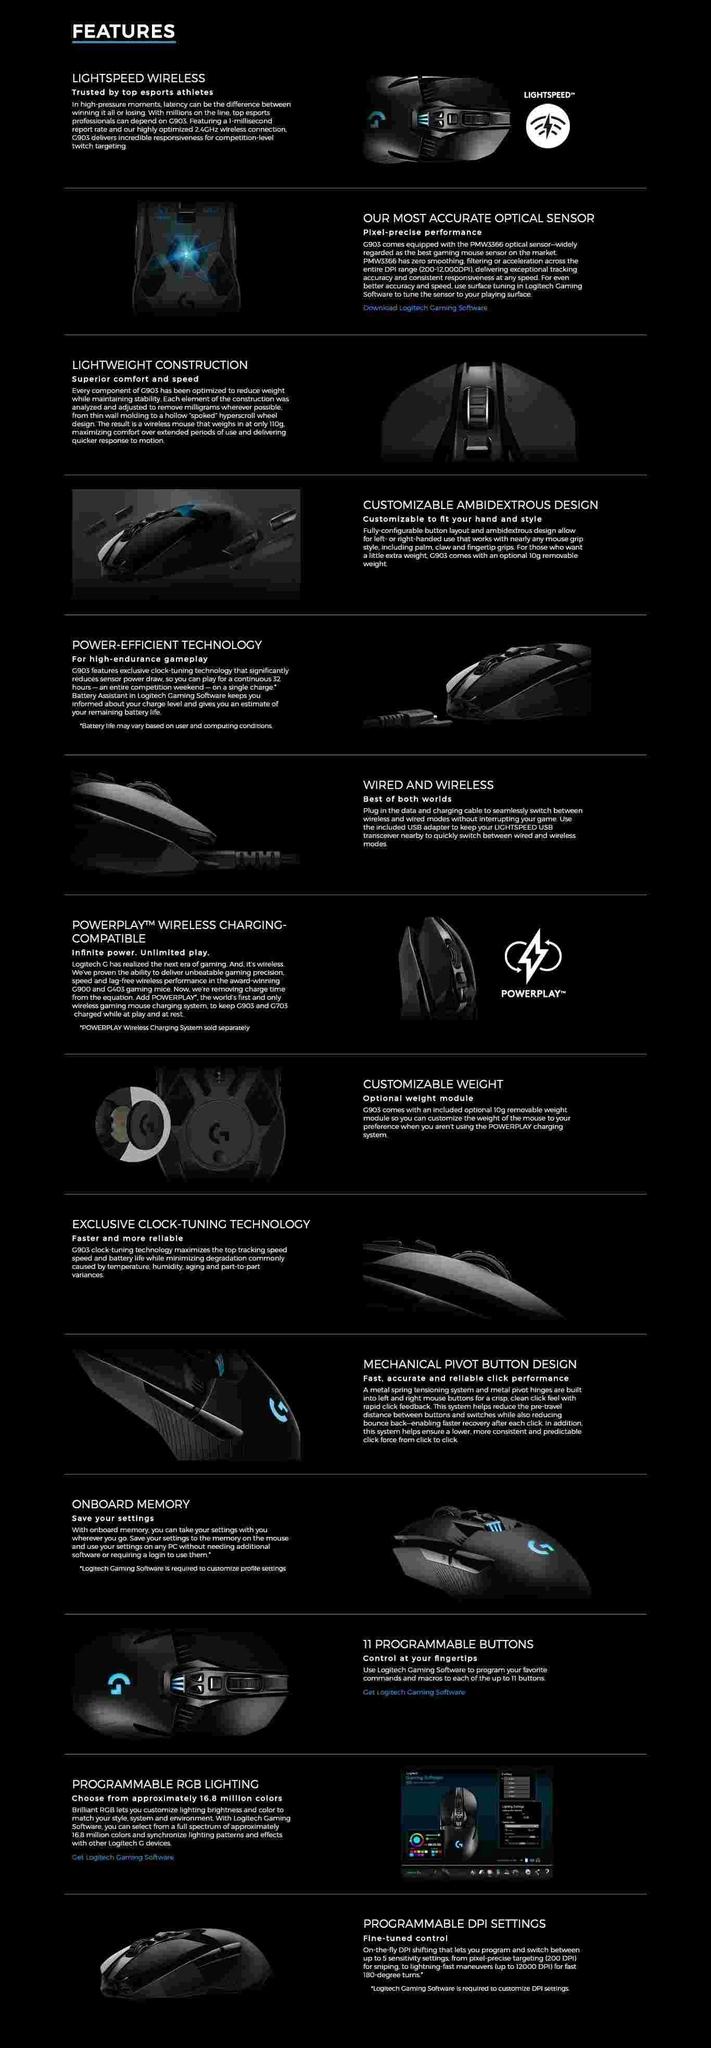 Logitech G903 LightSpeed Wireless Gaming Mouse BDZ @ Best Price